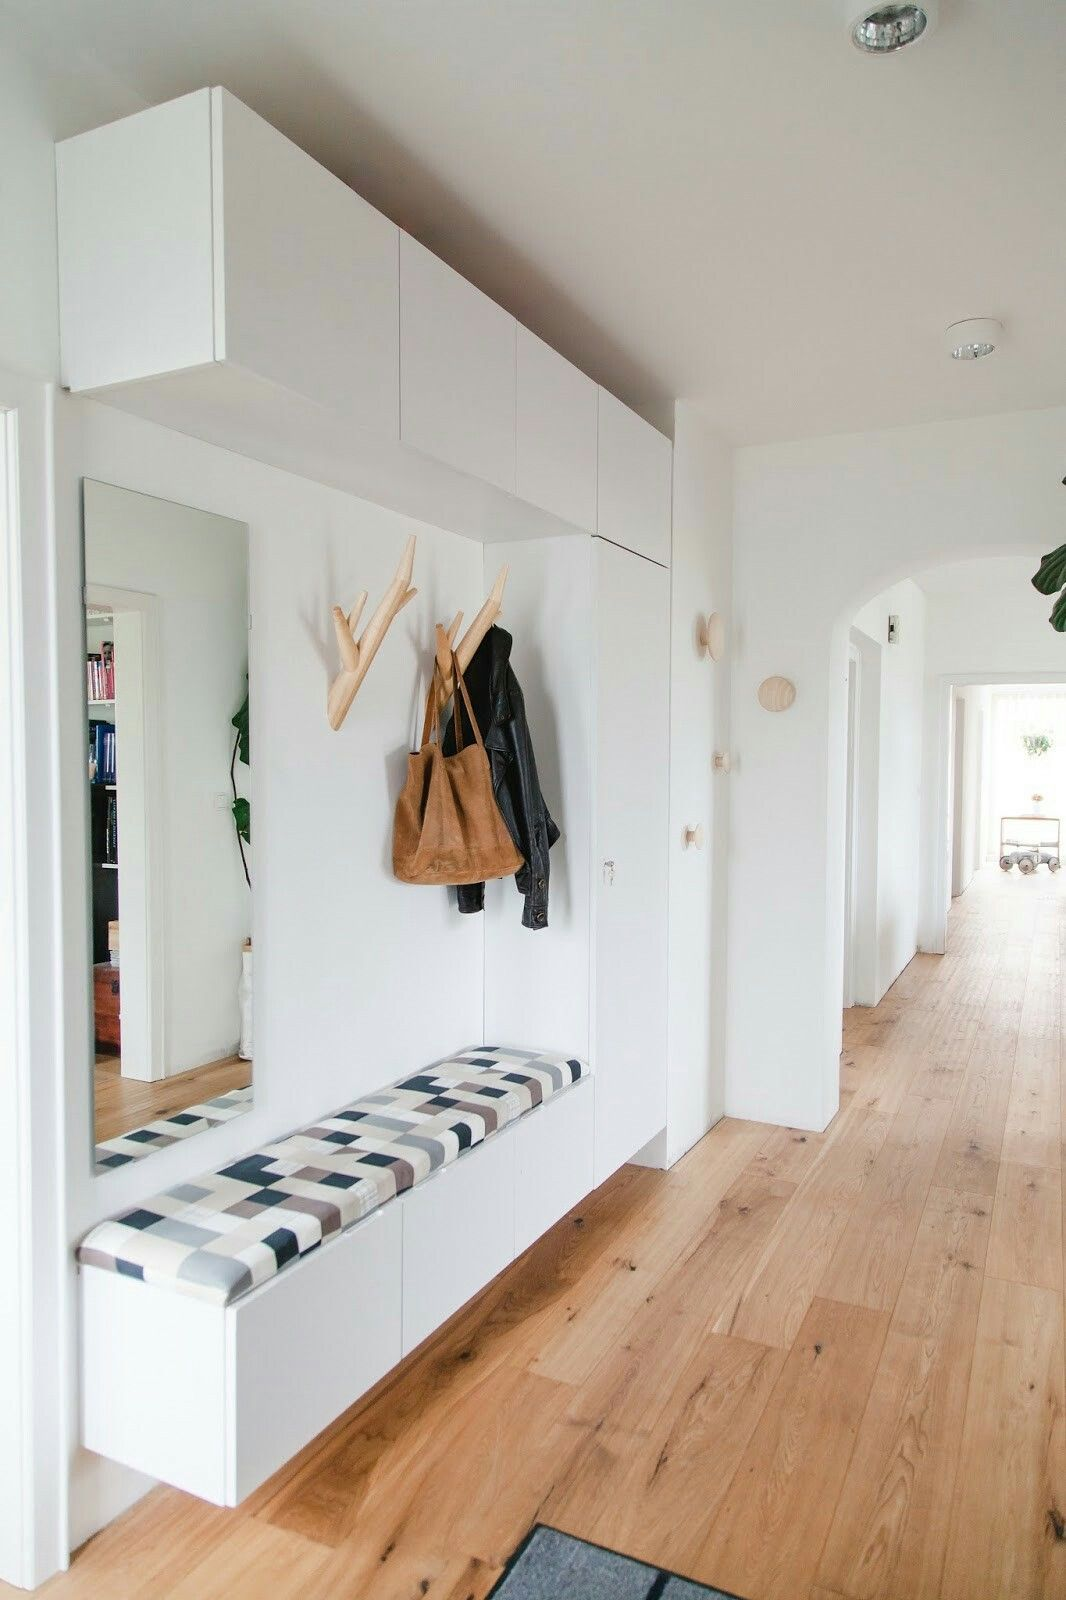 entryway ingresso | home | Pinterest | Ingresso, Arredamento e Soggiorno